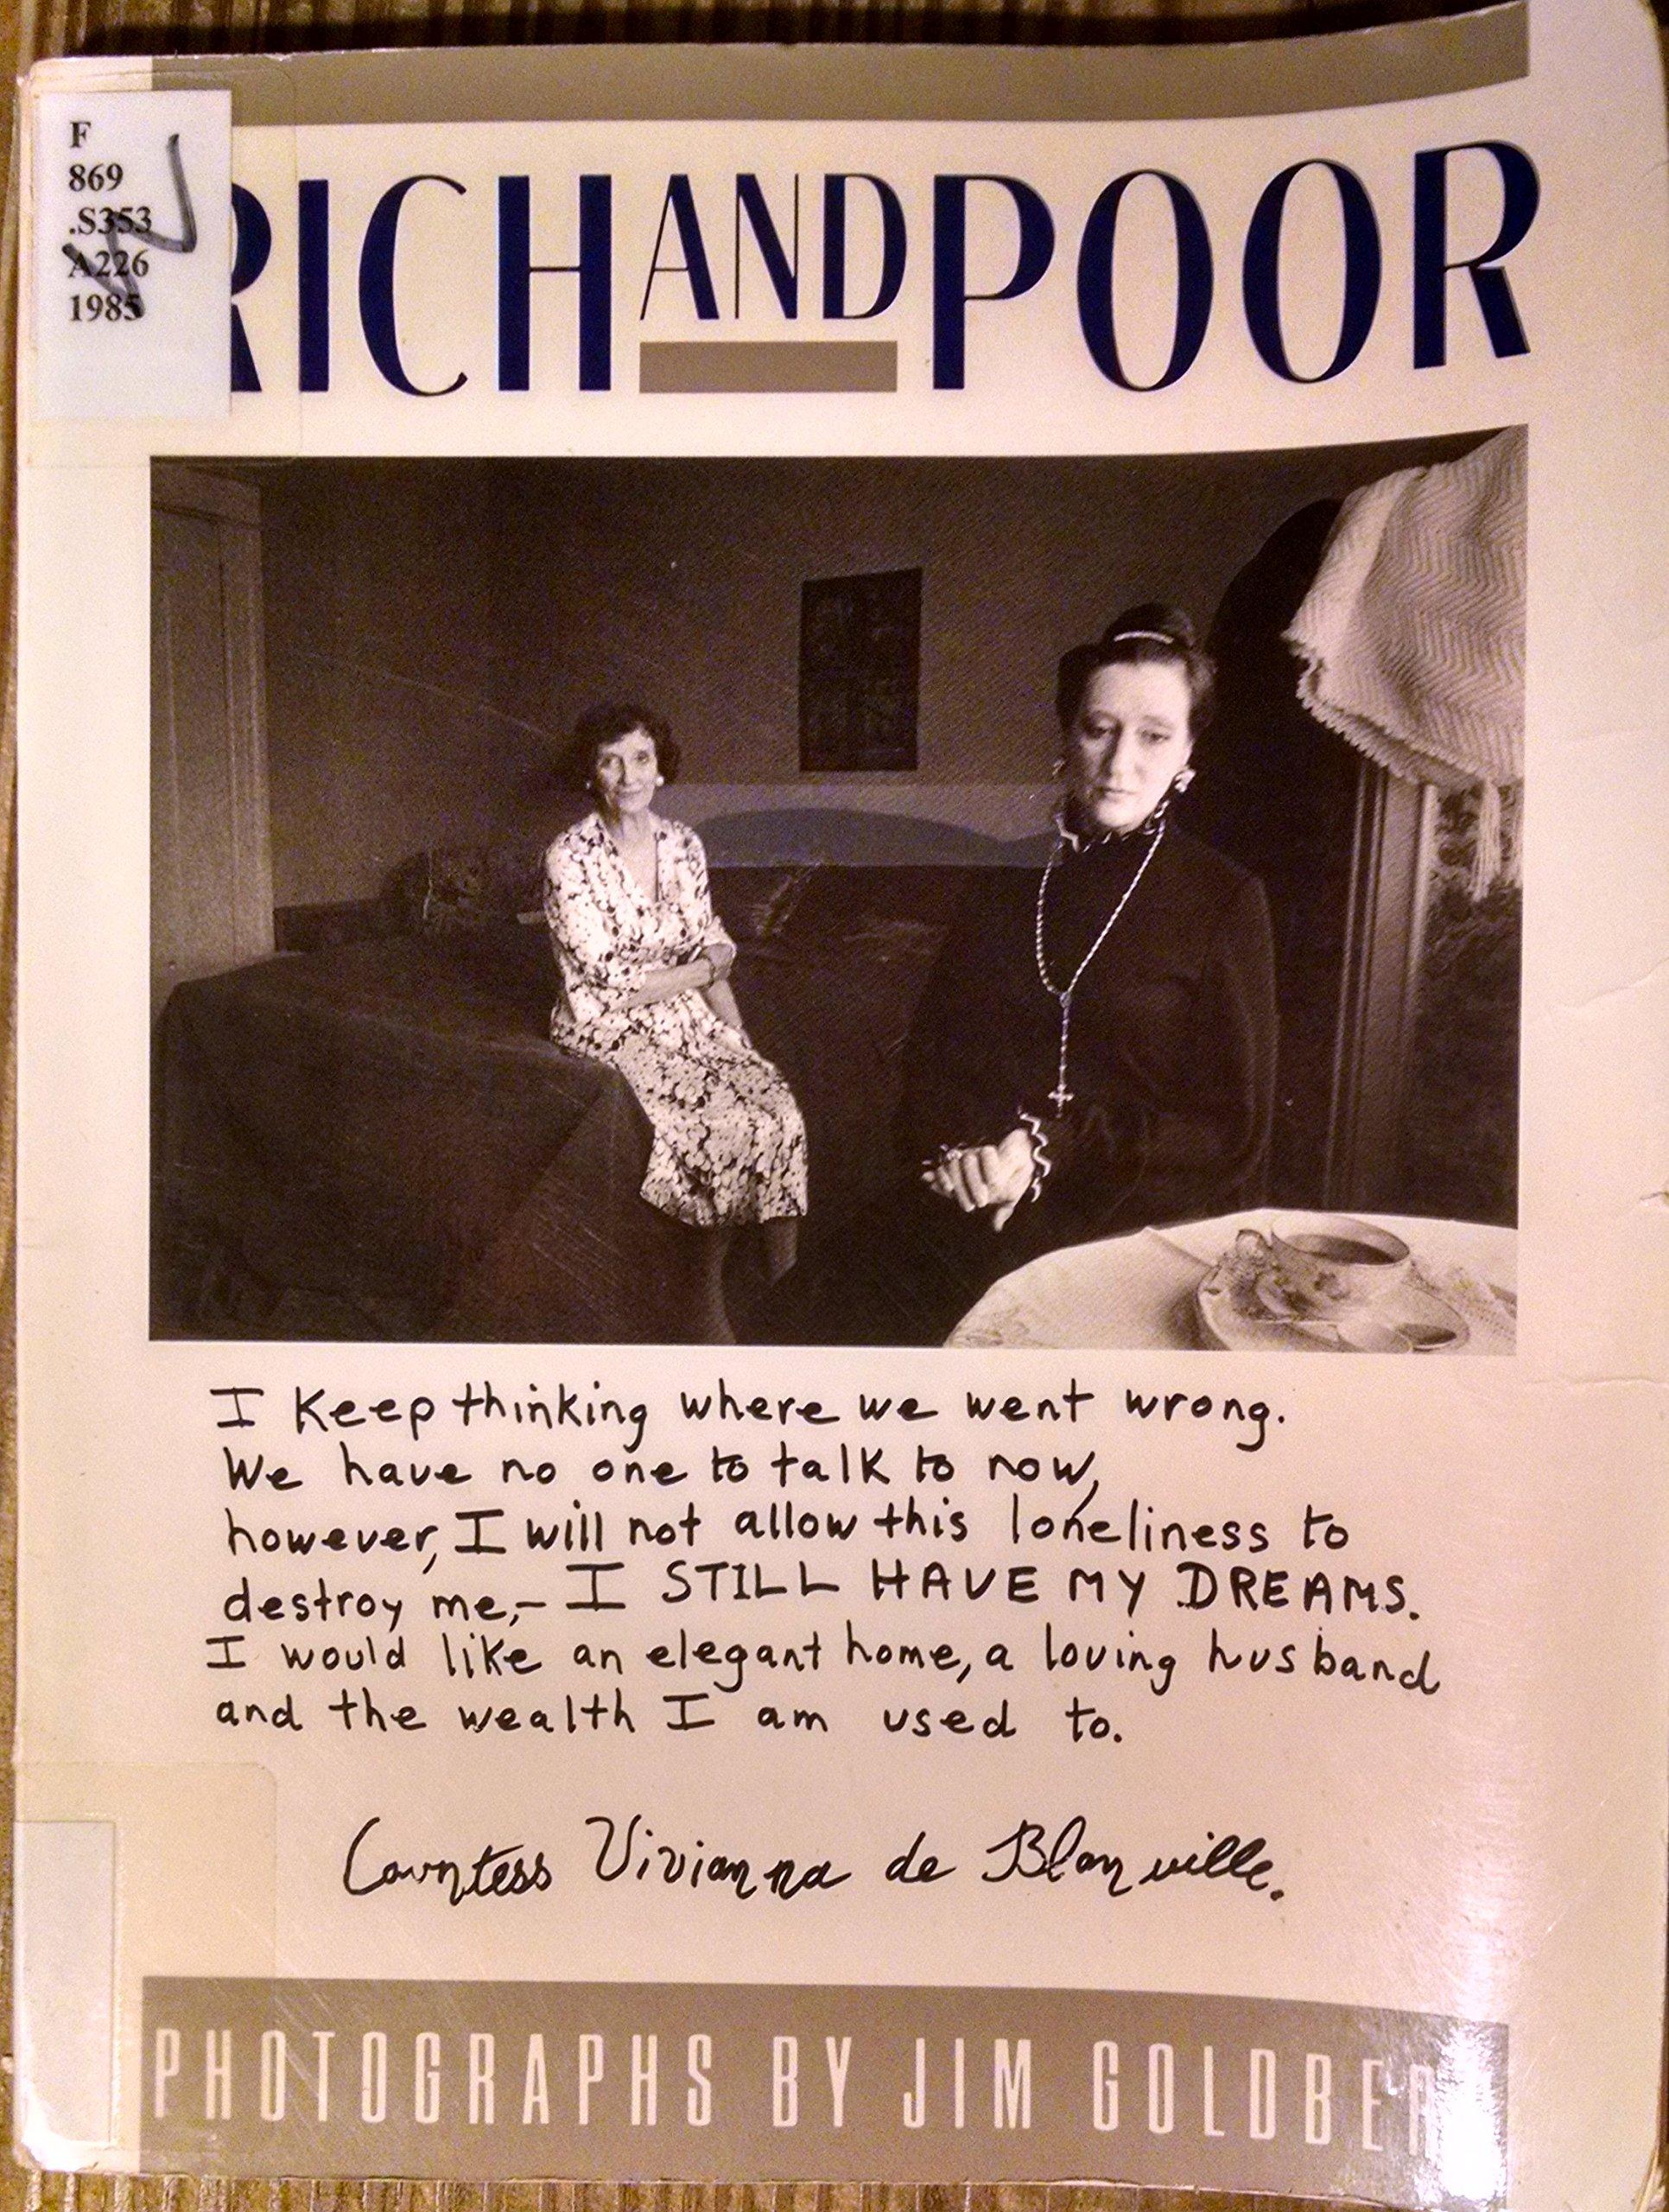 rich and poor photographs jim goldberg 9780394741567 amazon com